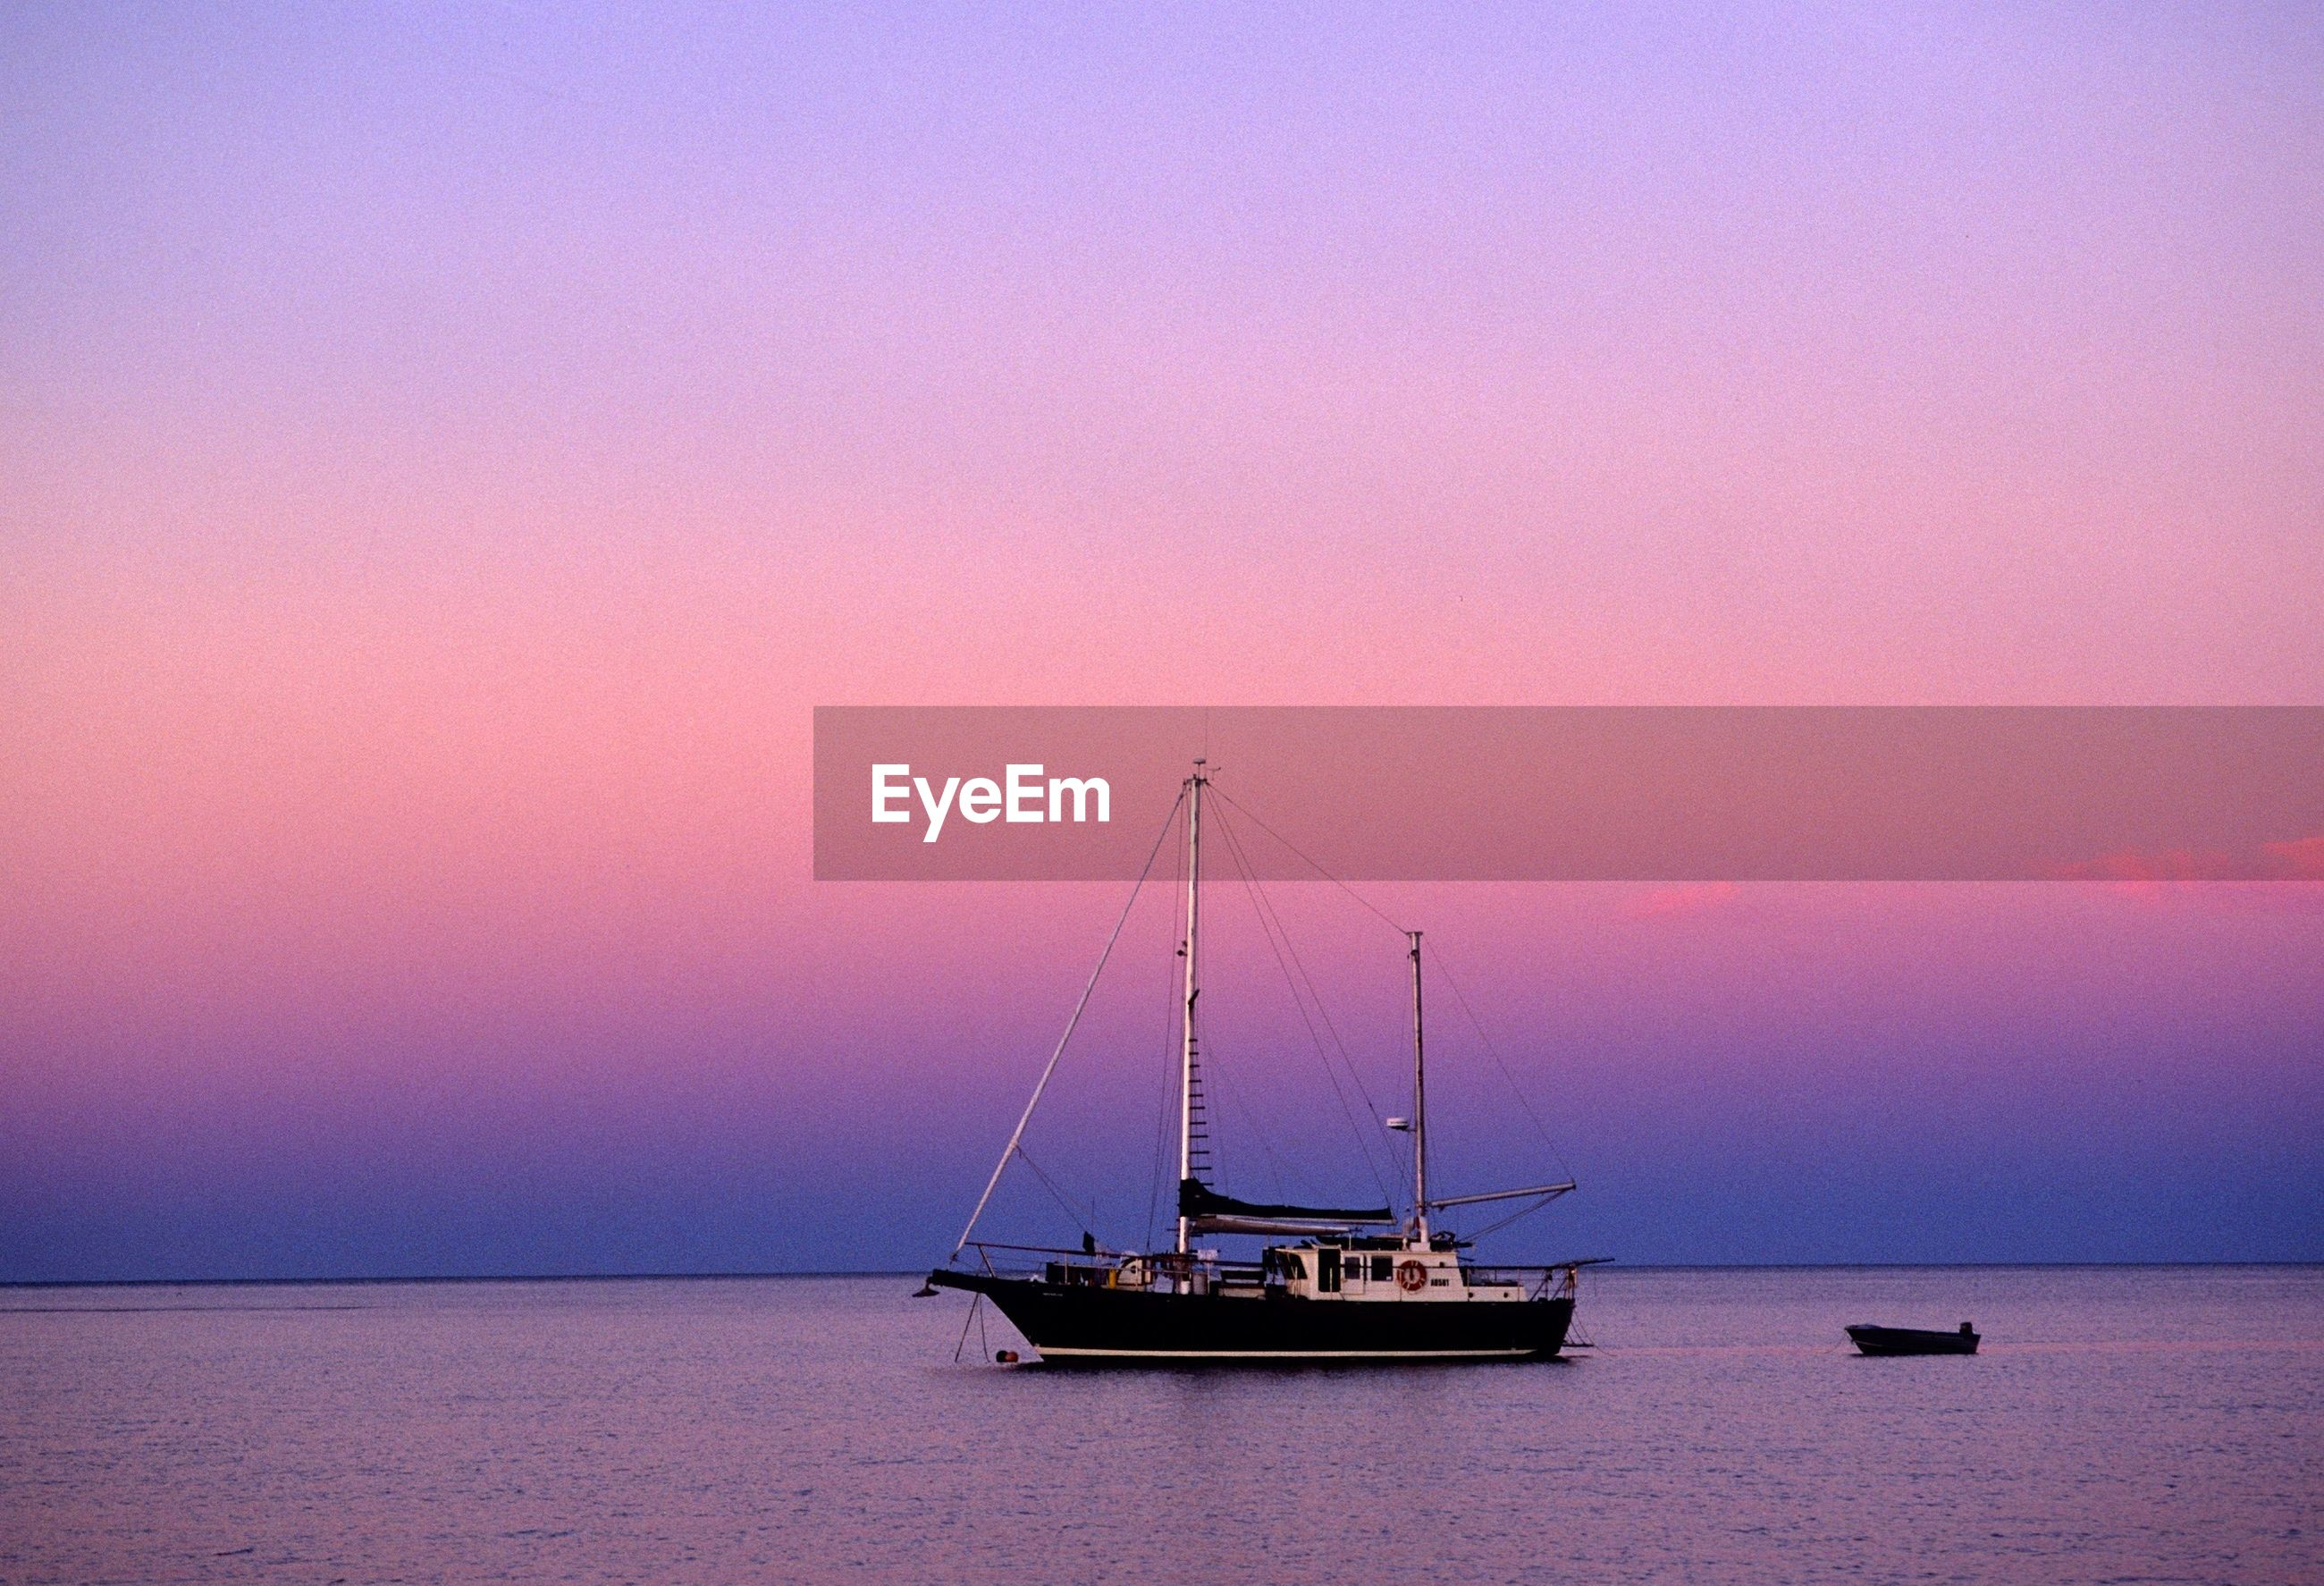 Sailboat in sea against romantic sky at sunset